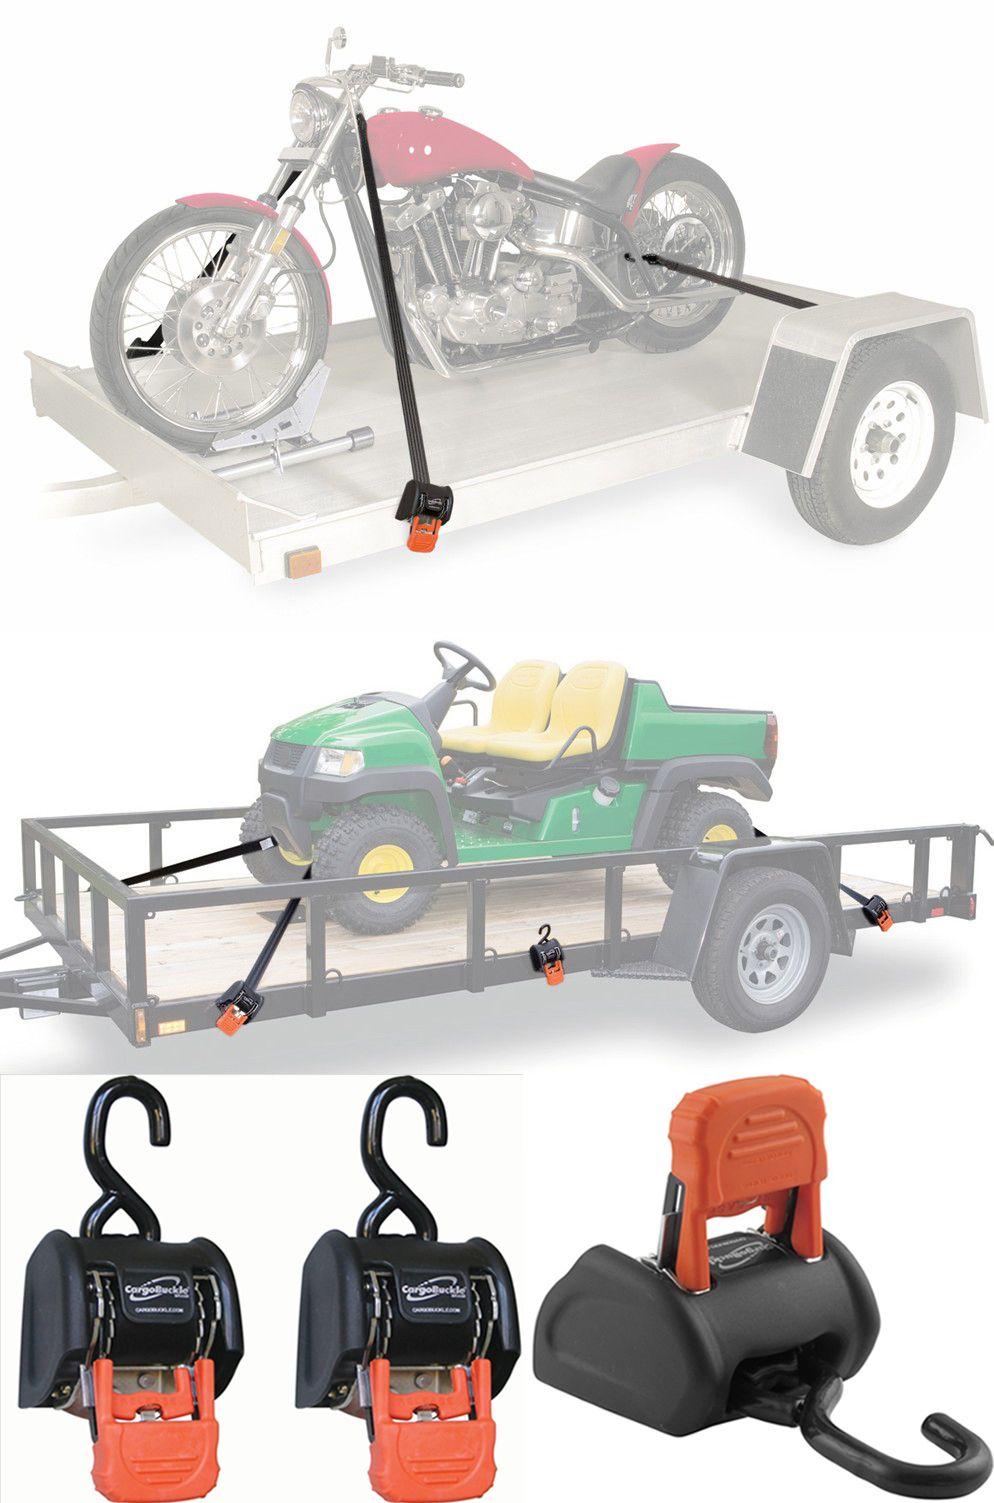 Cargobuckle g3 retractable ratchet tiedown straps bolt